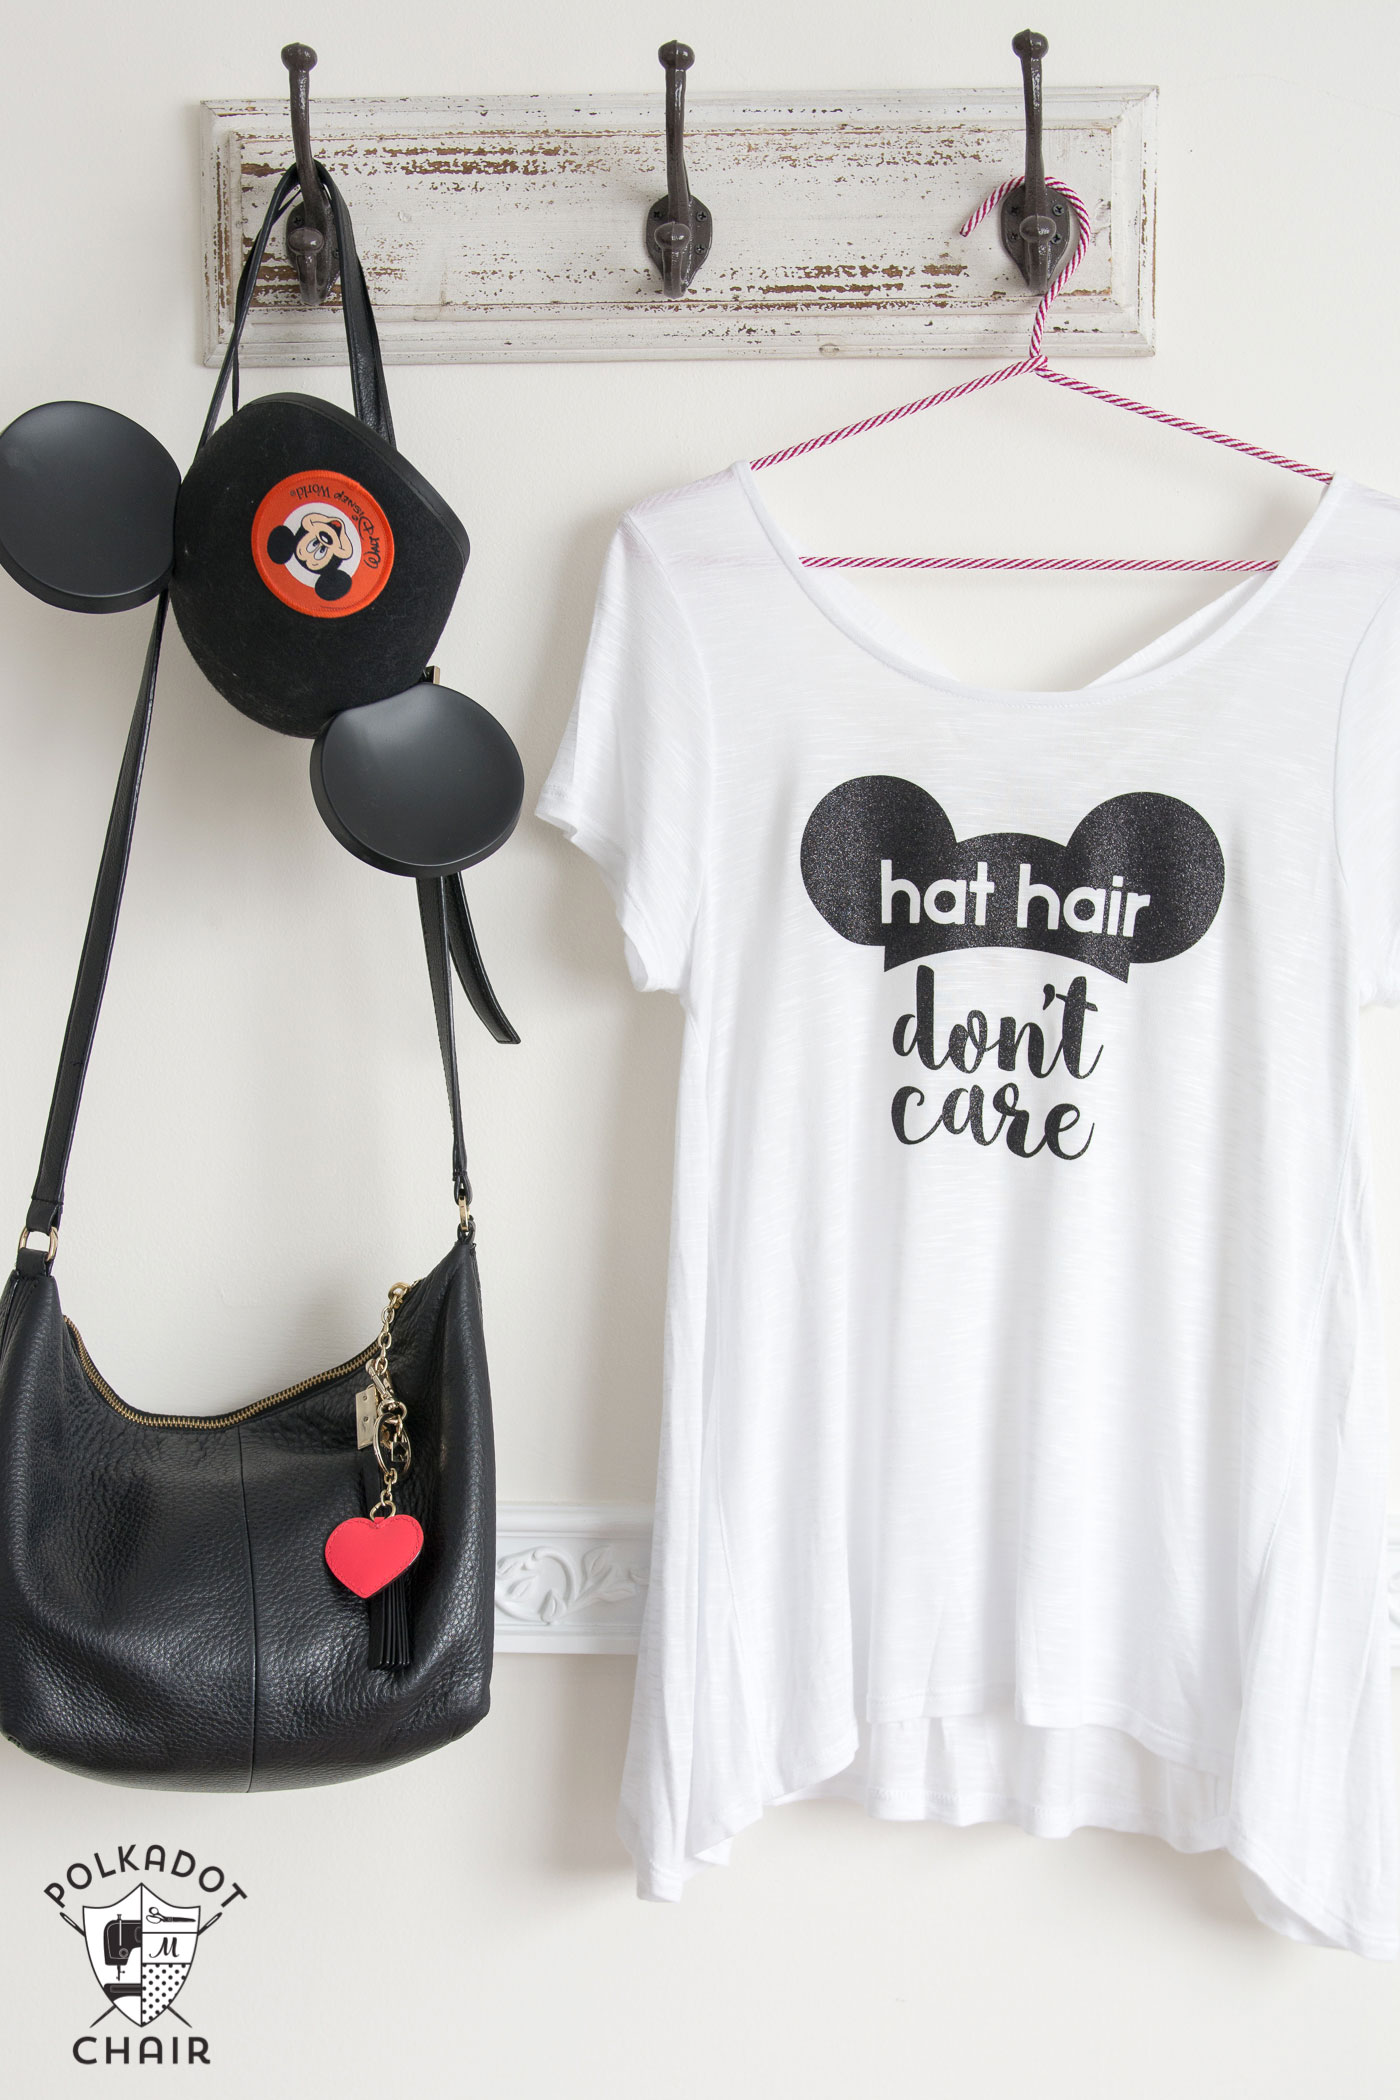 Diy Disney T Shirt Hat Hair Don T Care The Polka Dot Chair